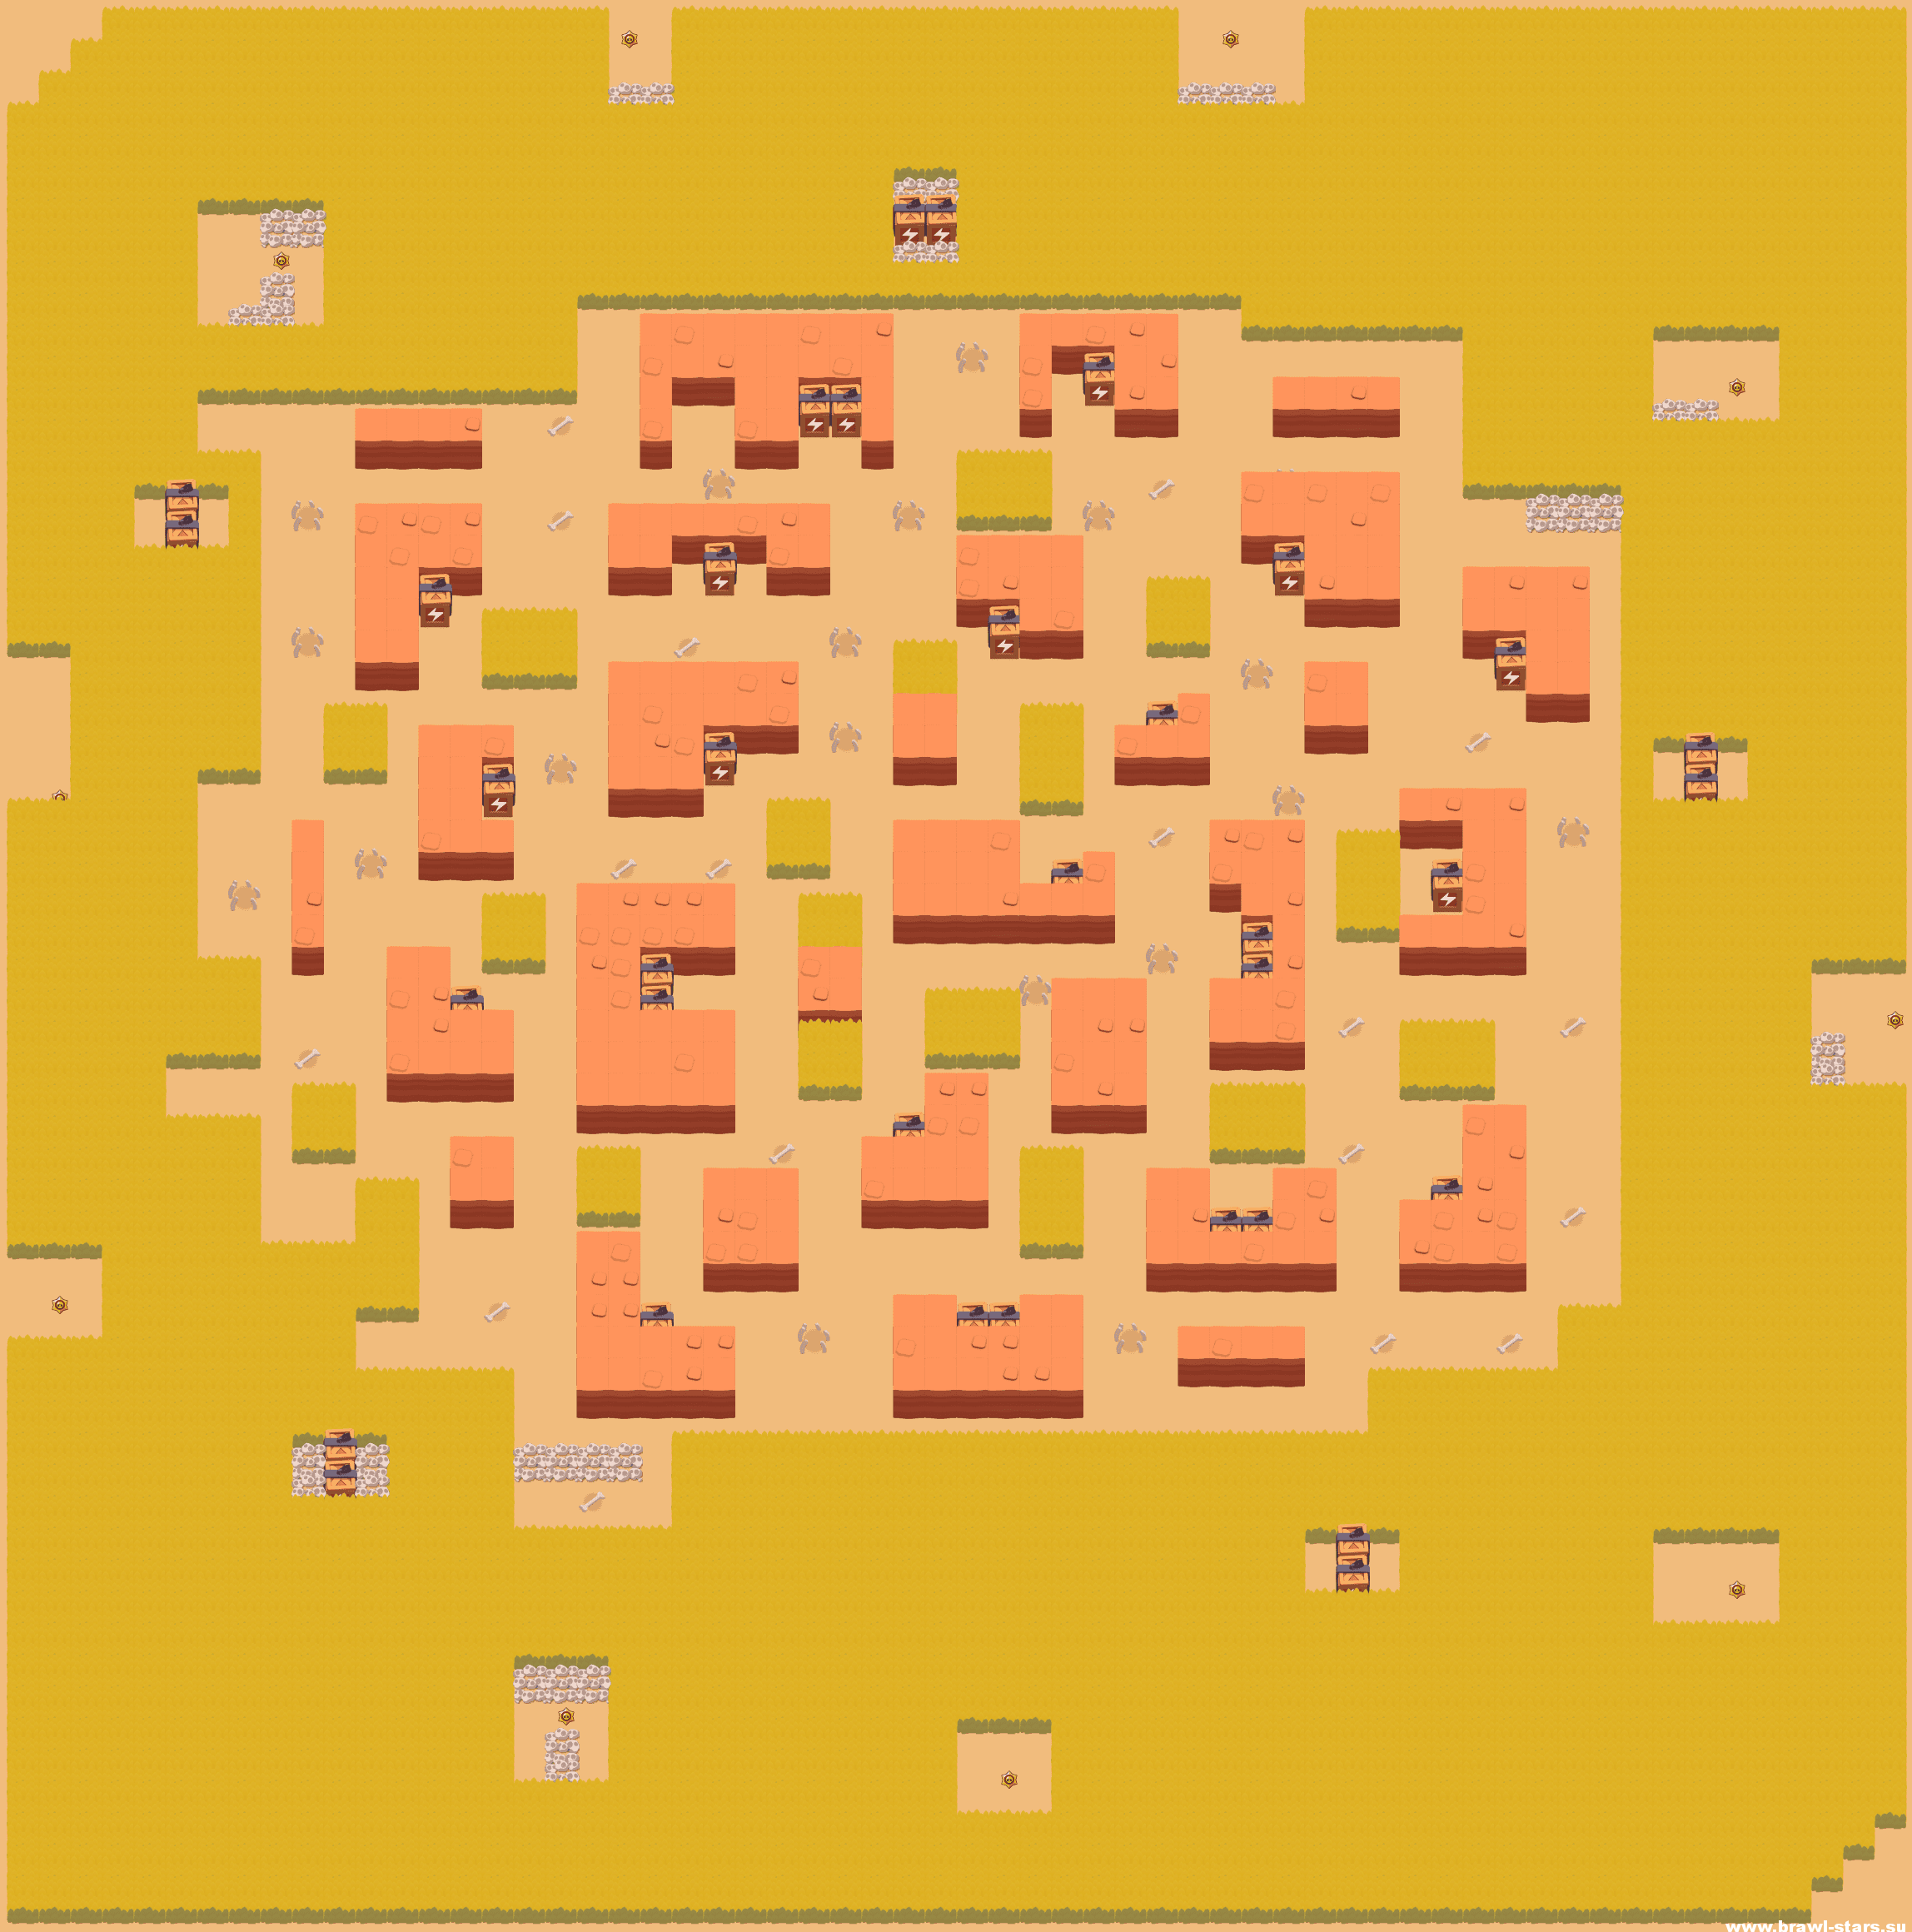 map_Survival_STORMY_PLAINS